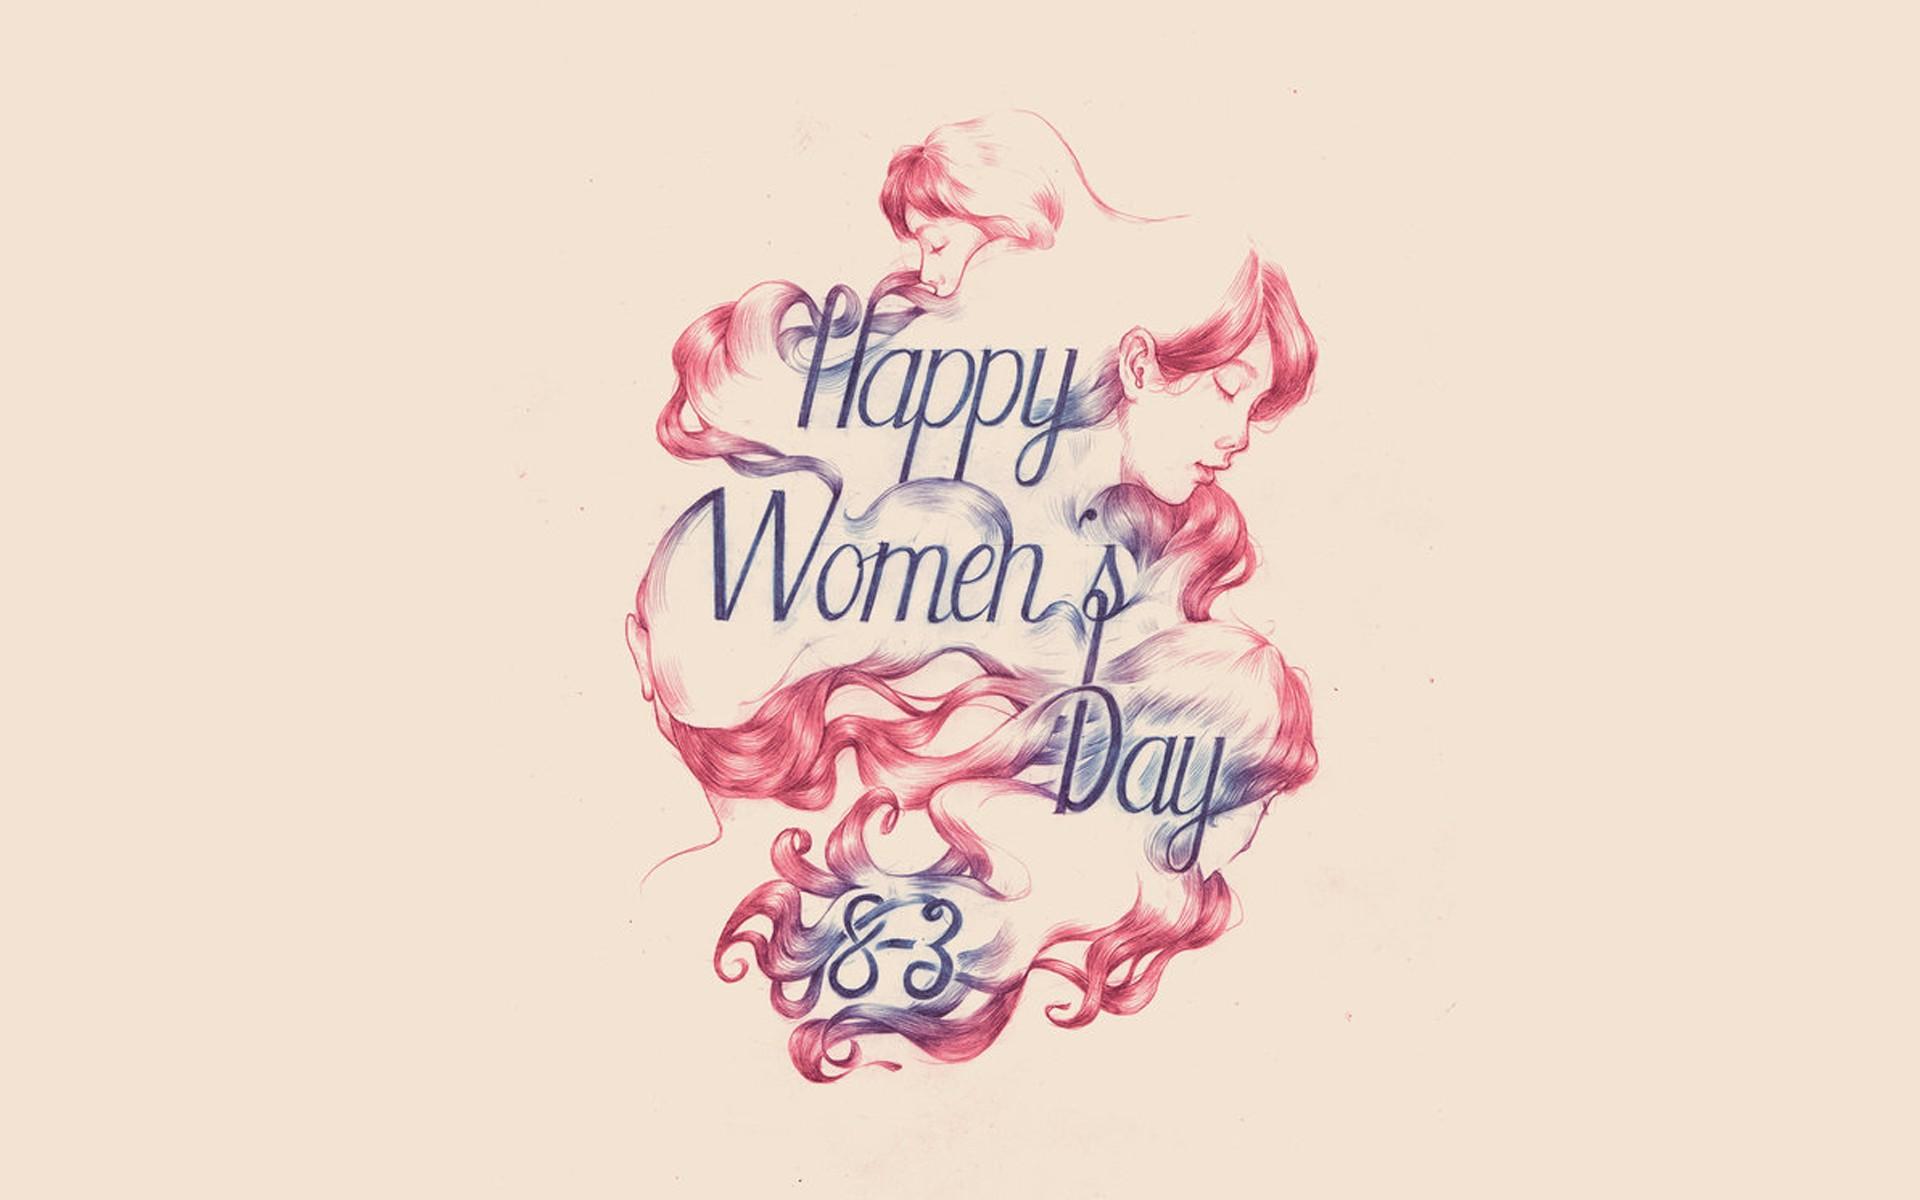 Original - Friend Happy Women's Day , HD Wallpaper & Backgrounds